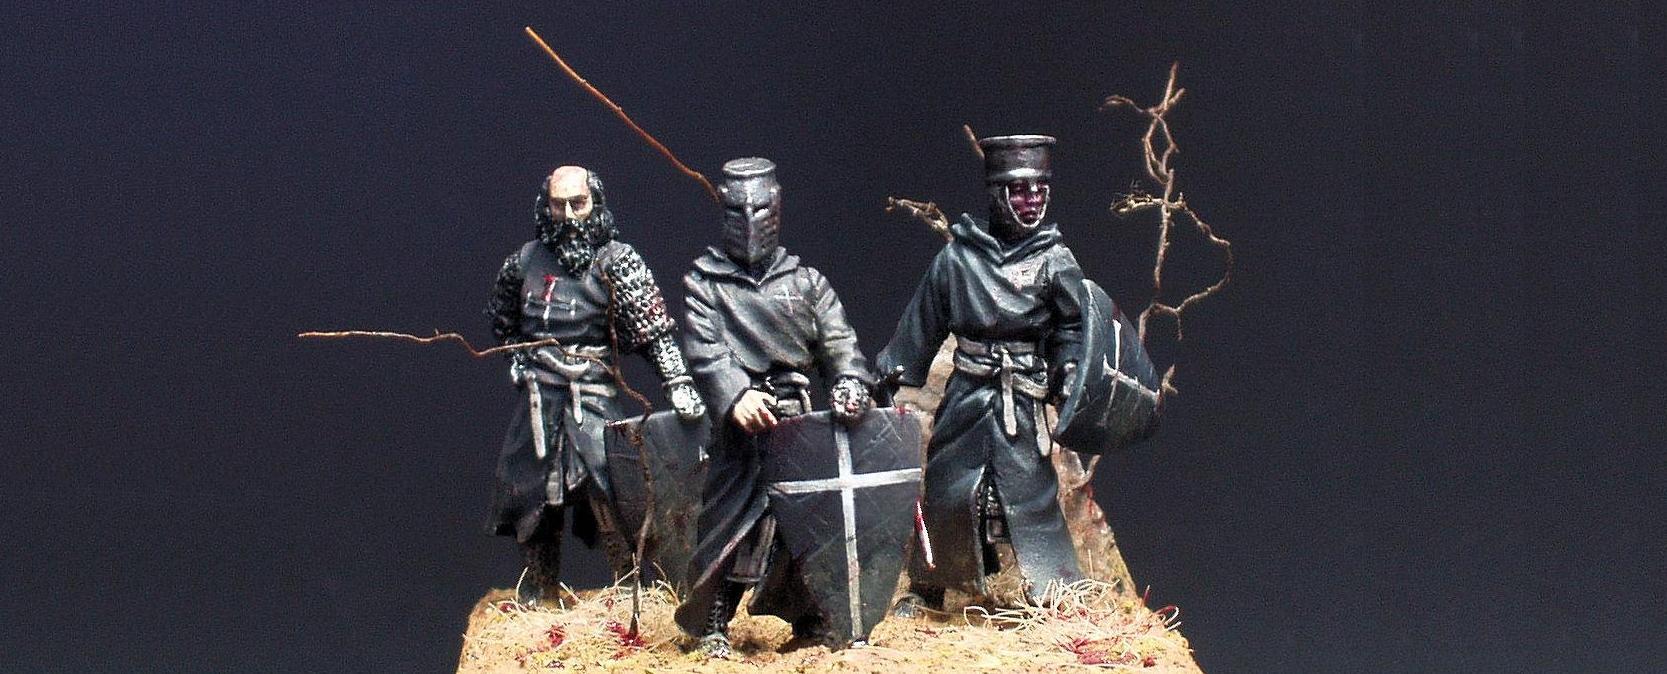 Valdemar Miniatures 25mm Medieval Figures wargaming.info